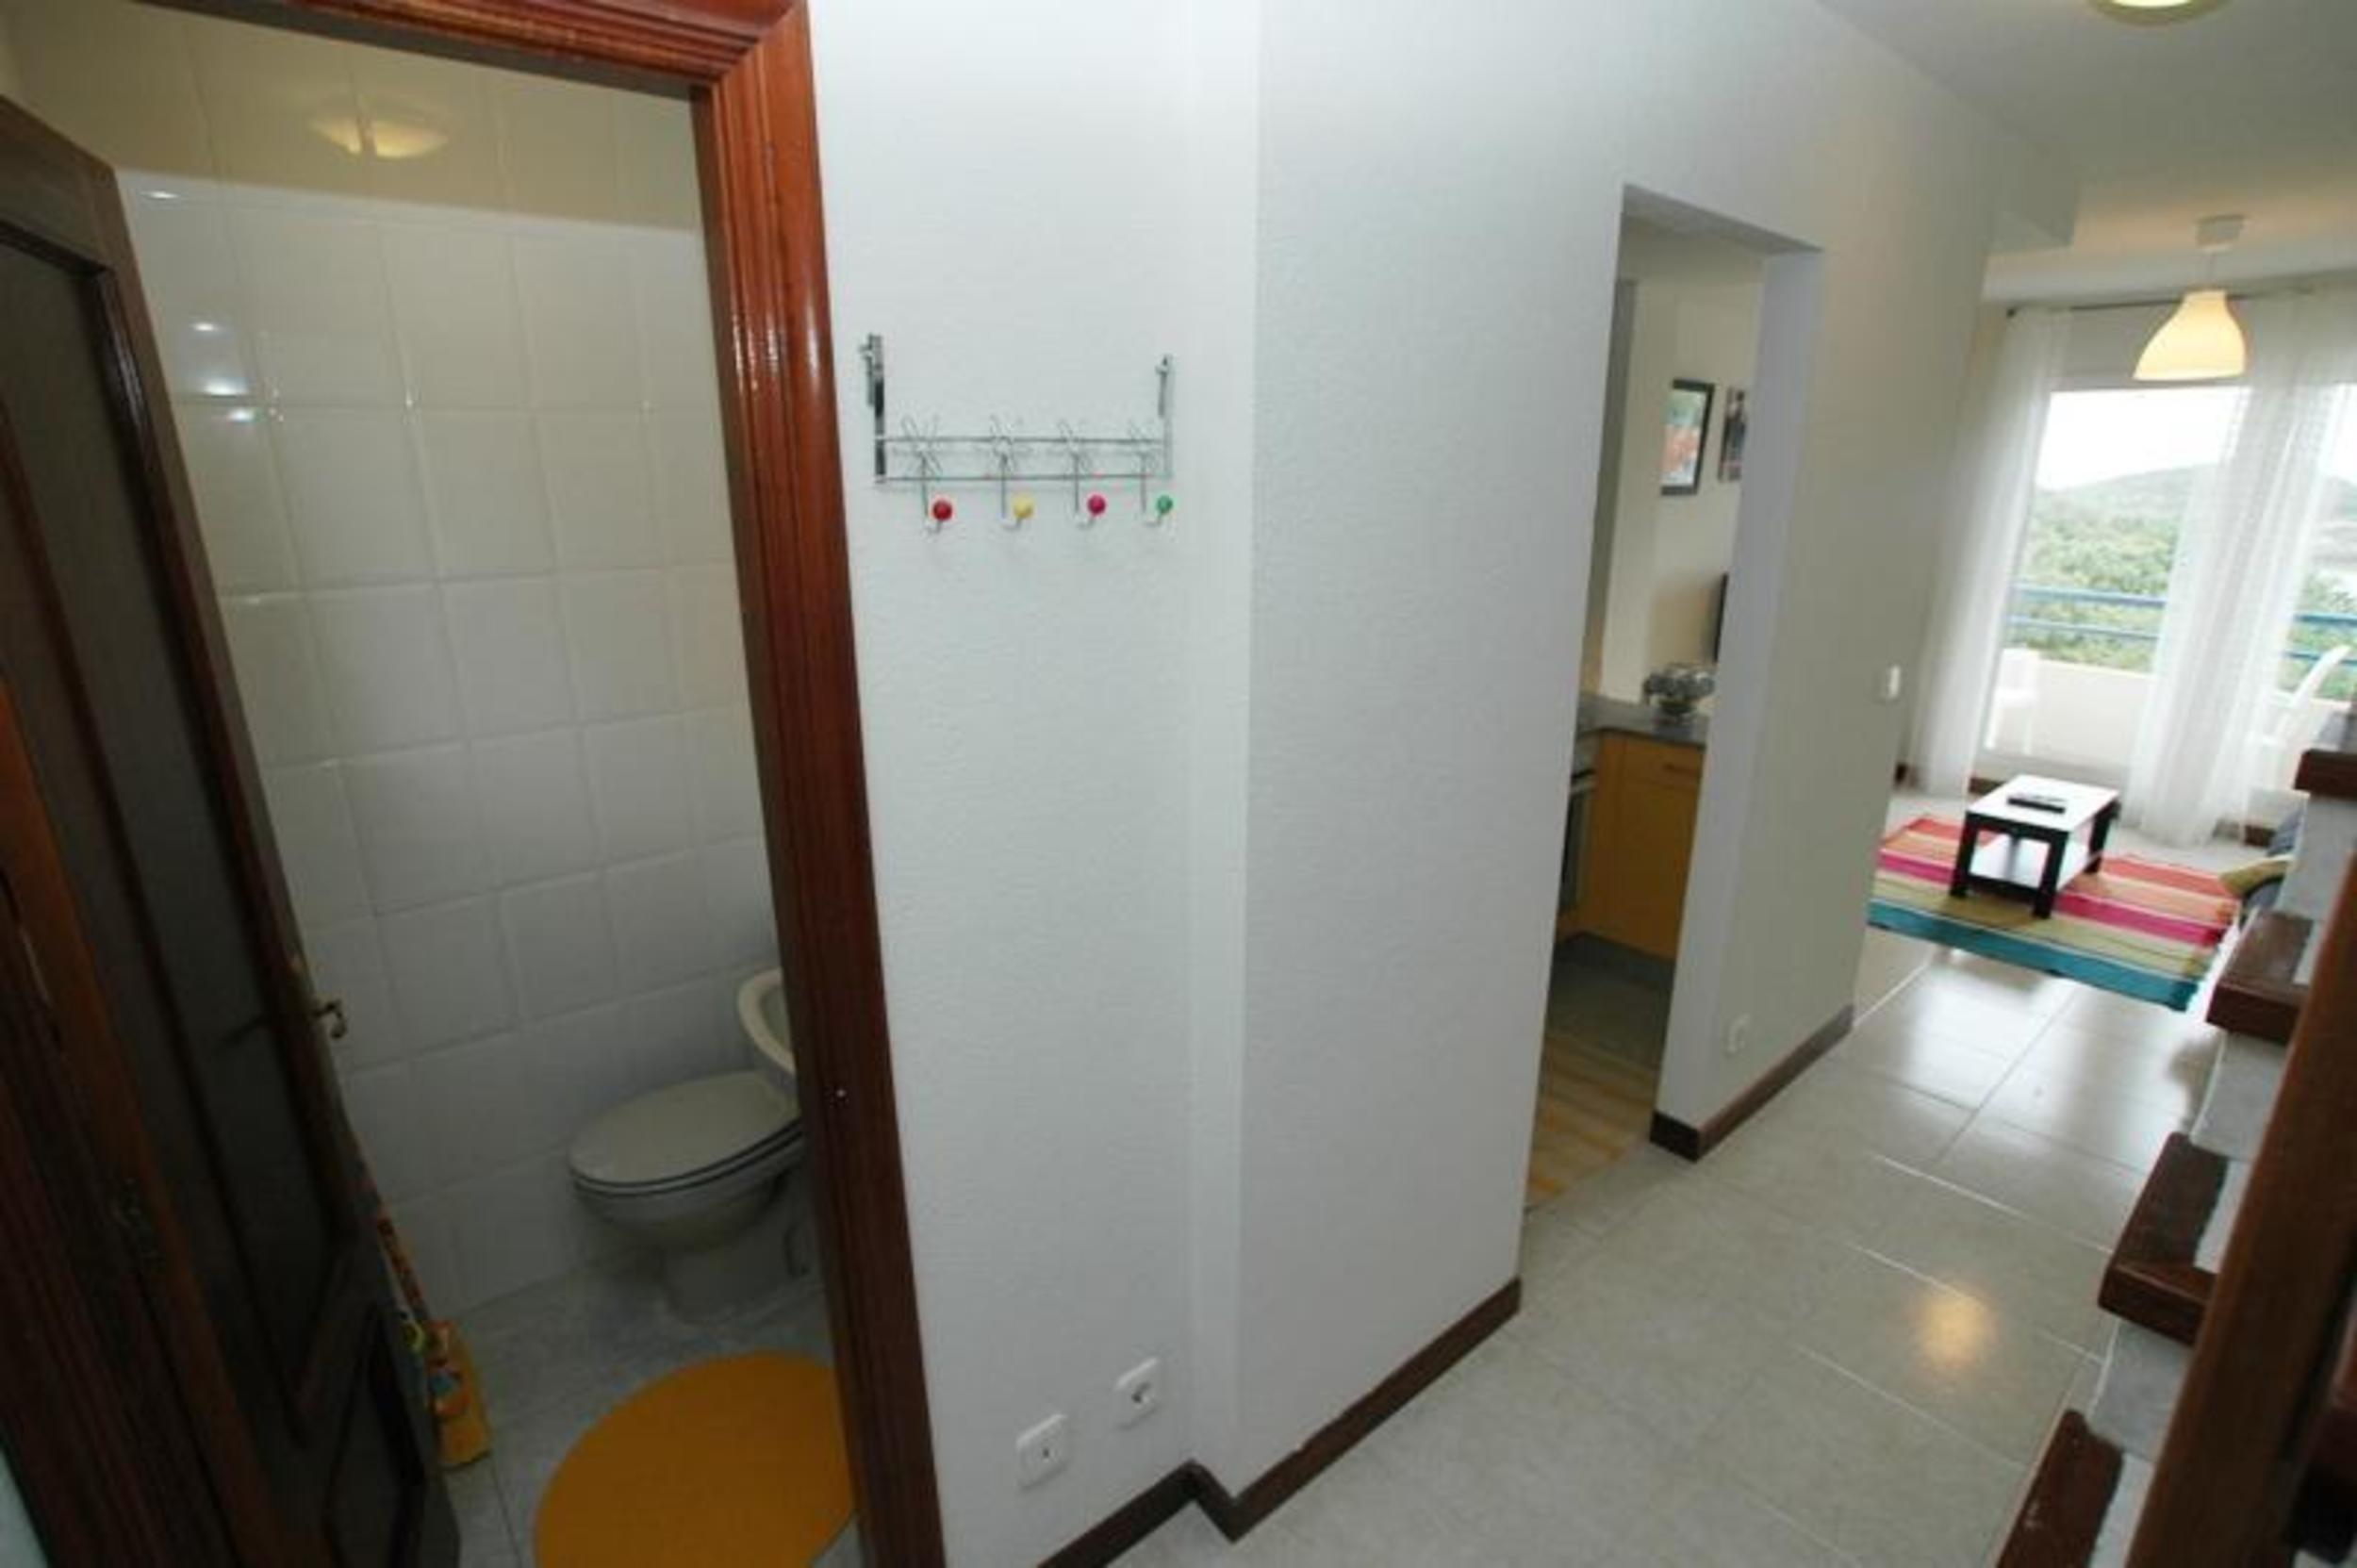 Ferienwohnung Apartment - 2 Bedrooms with Pool and Sea views - 102775 (2360880), Isla, Costa de Cantabria, Kantabrien, Spanien, Bild 11